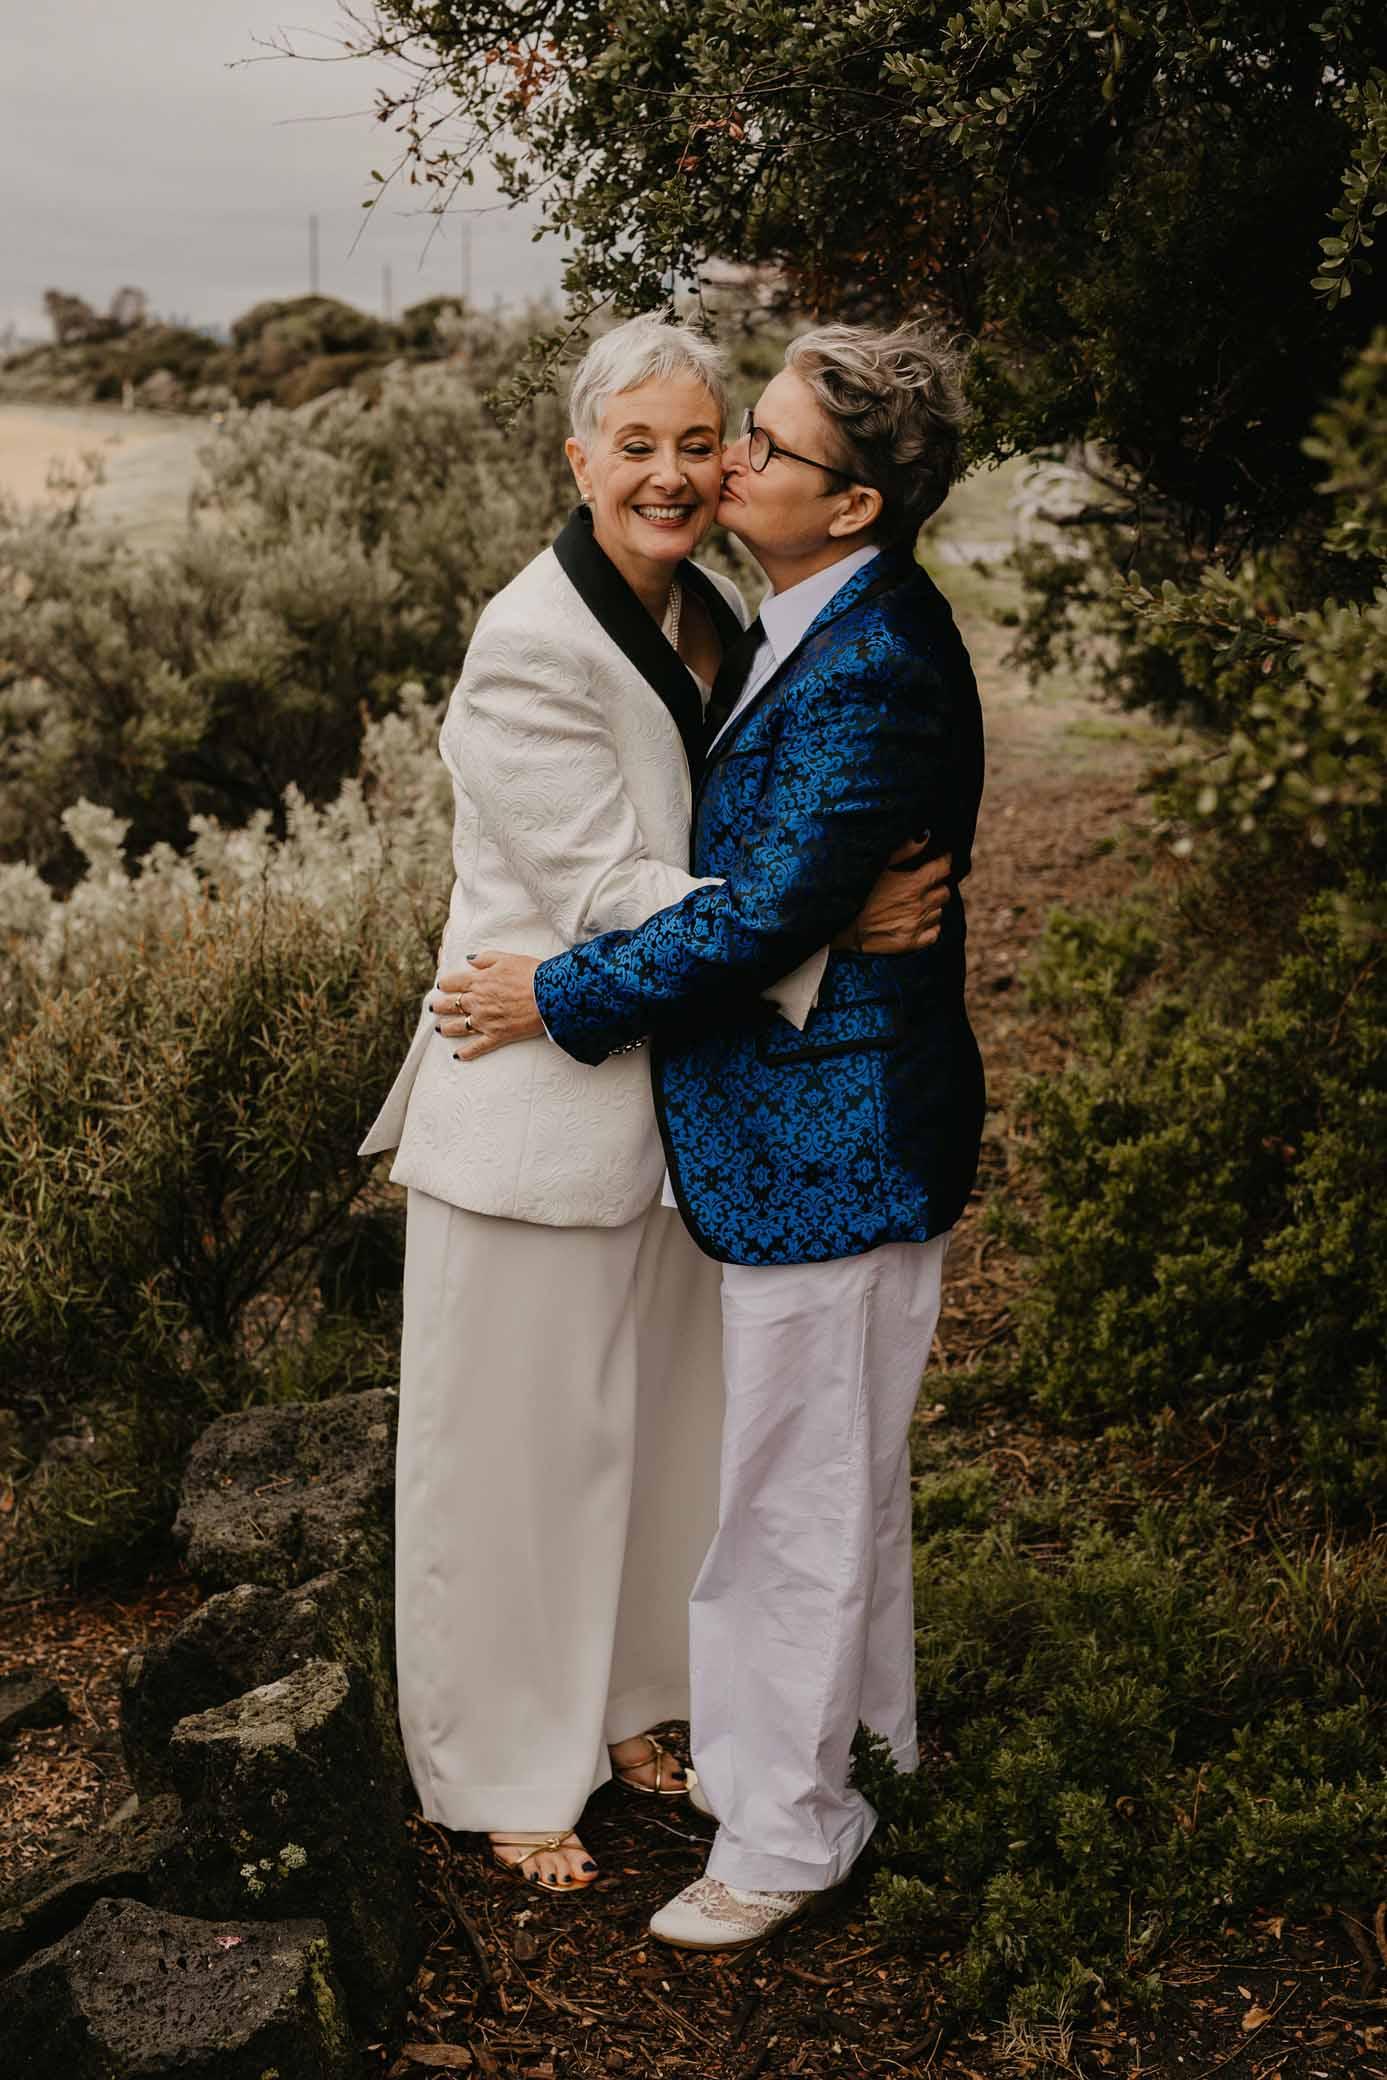 Til Death Wedding Film & Photography lesbian gay queer older couple Australian wedding elopement Melbourne Victoria Dancing With Her digital magazine